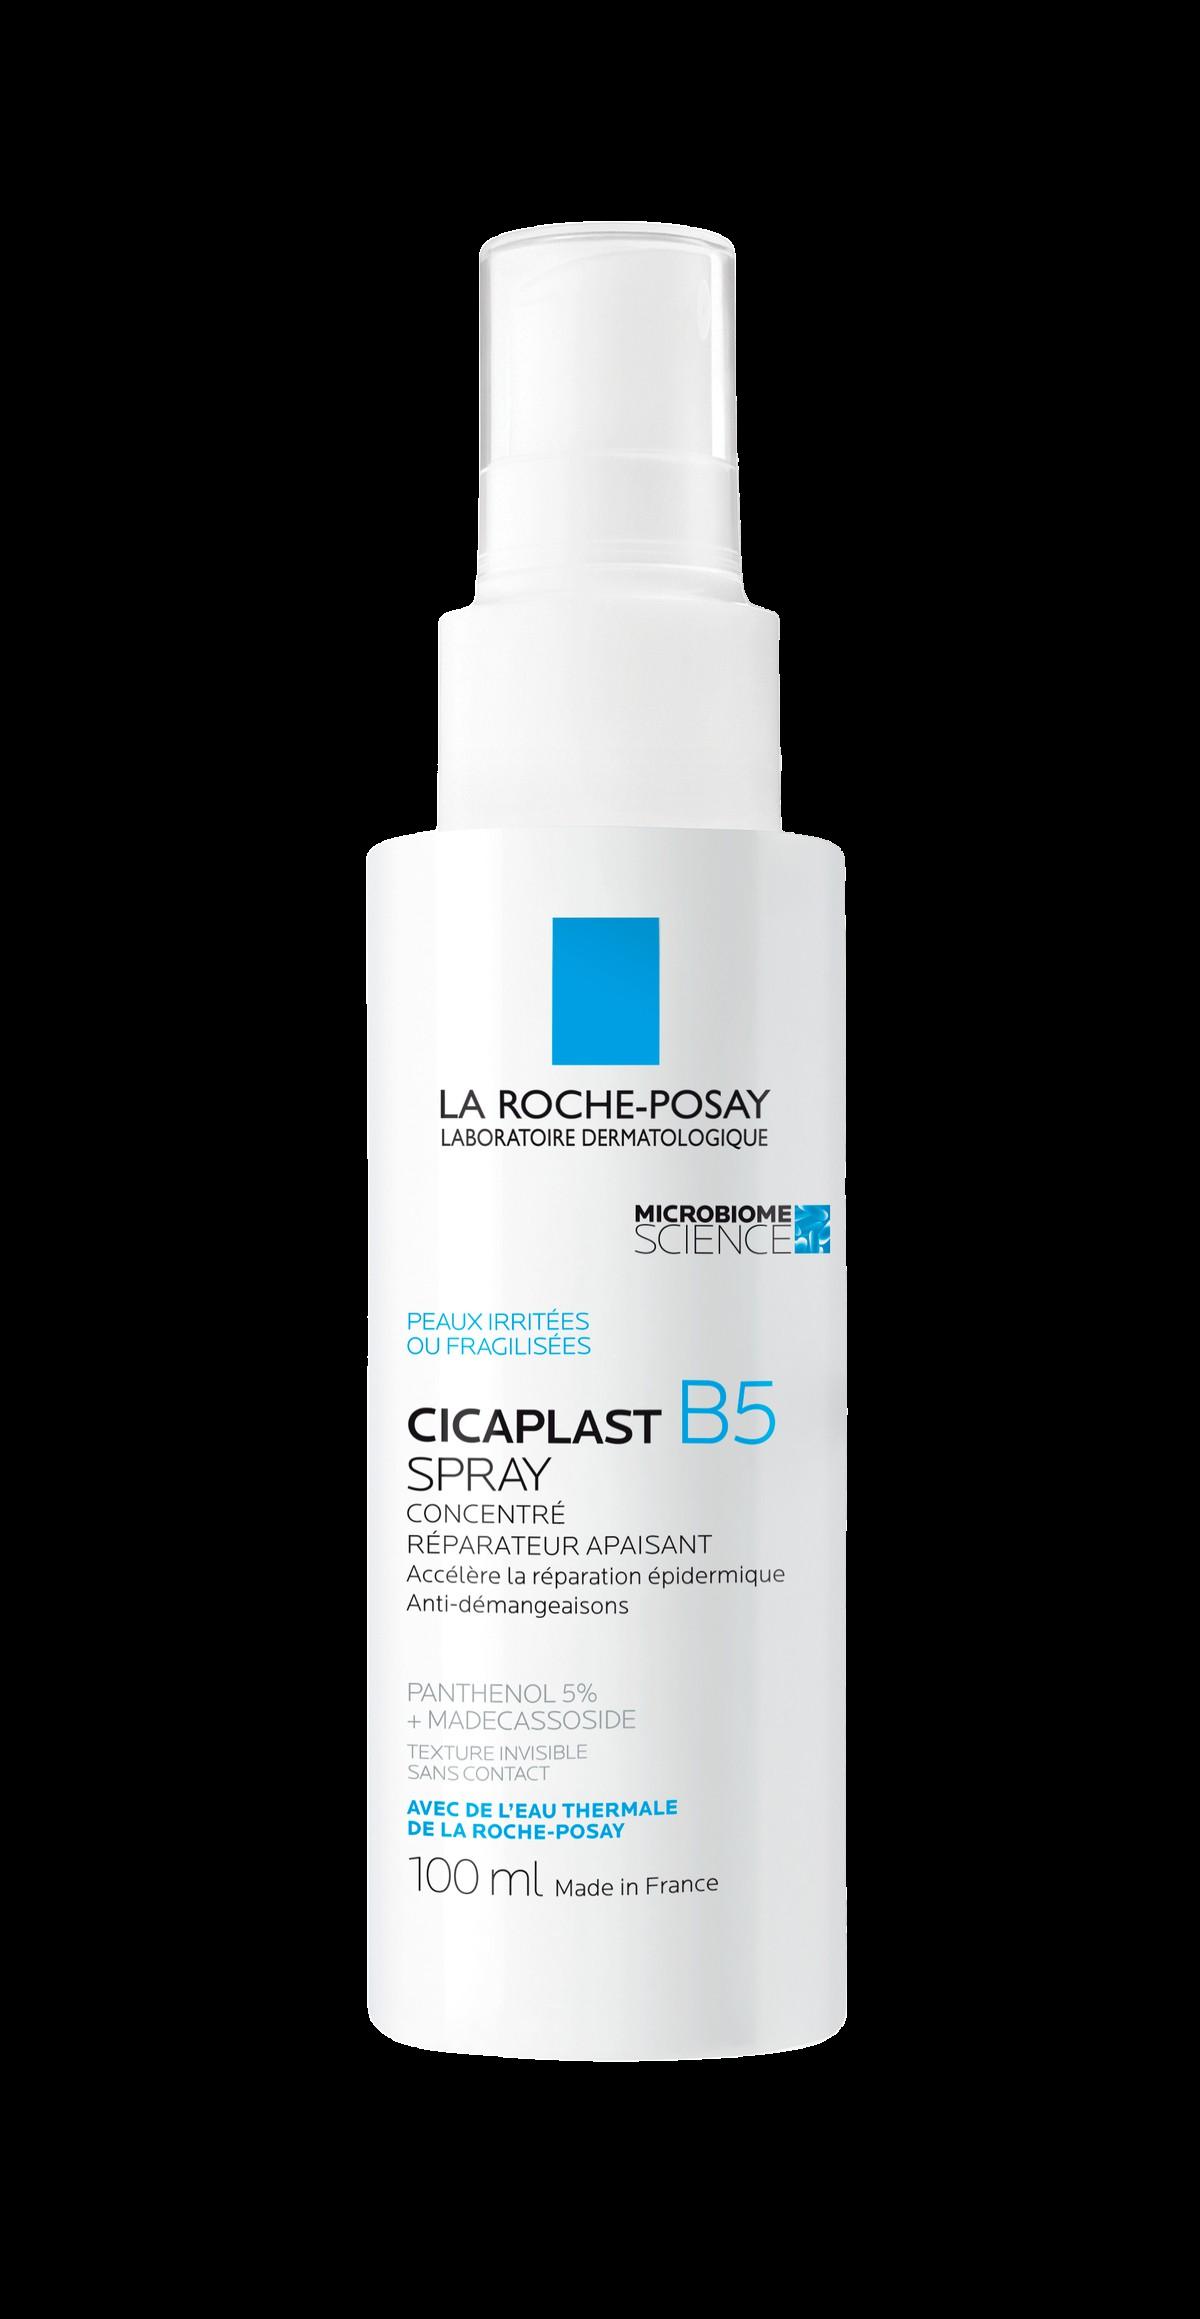 La Roche-Posay CICAPLAST B5 Upokojujúci sprej 100ml